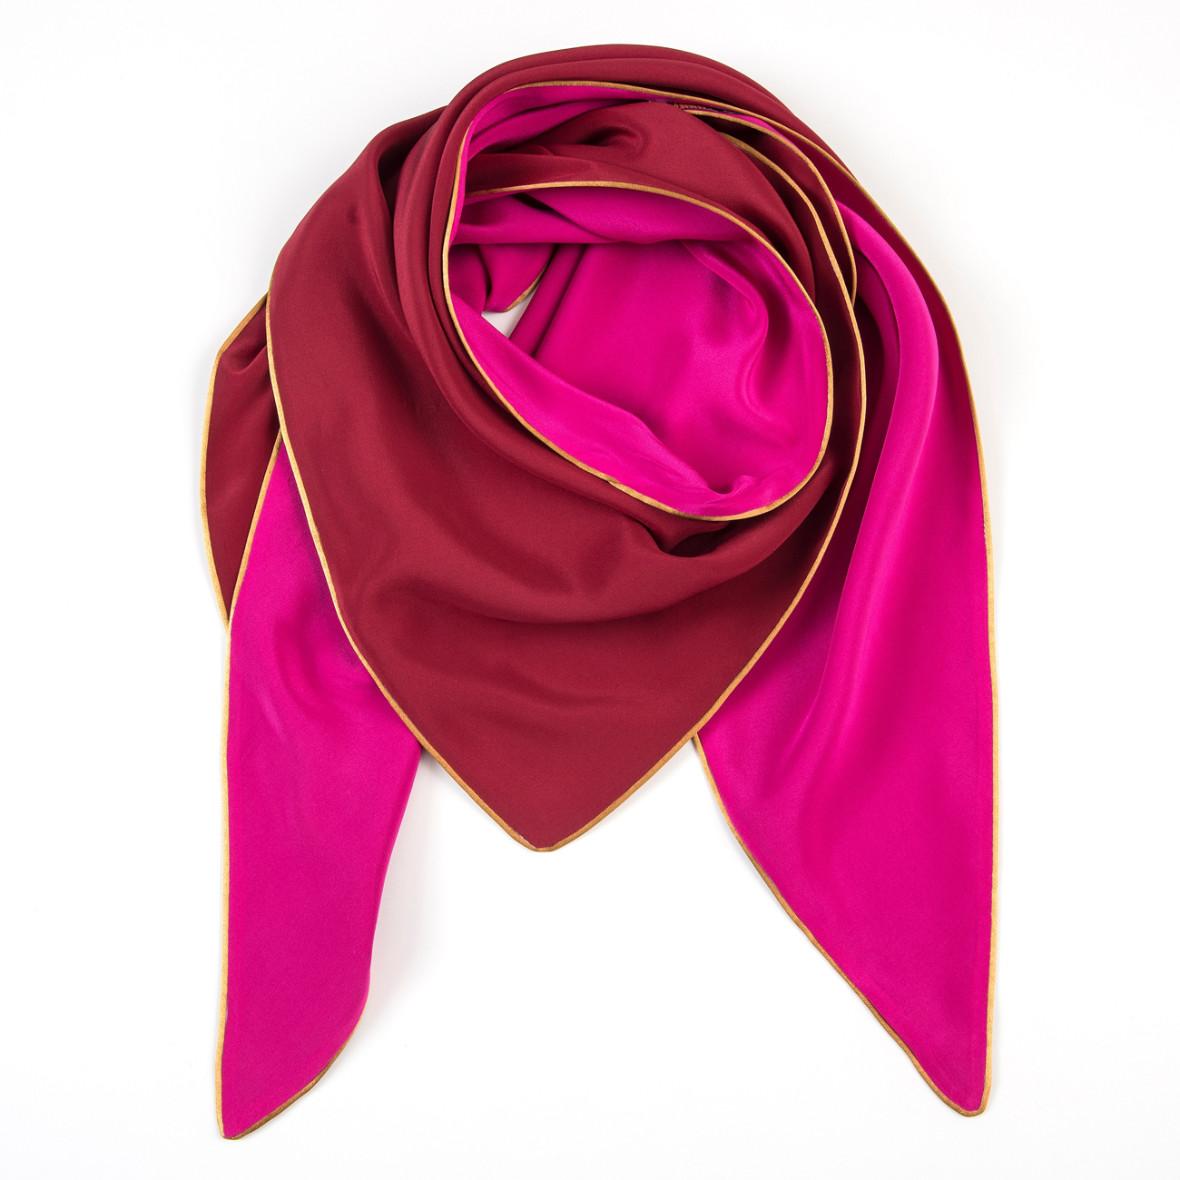 Dreieckschal Moitié-Carré Pink/Bordeaux